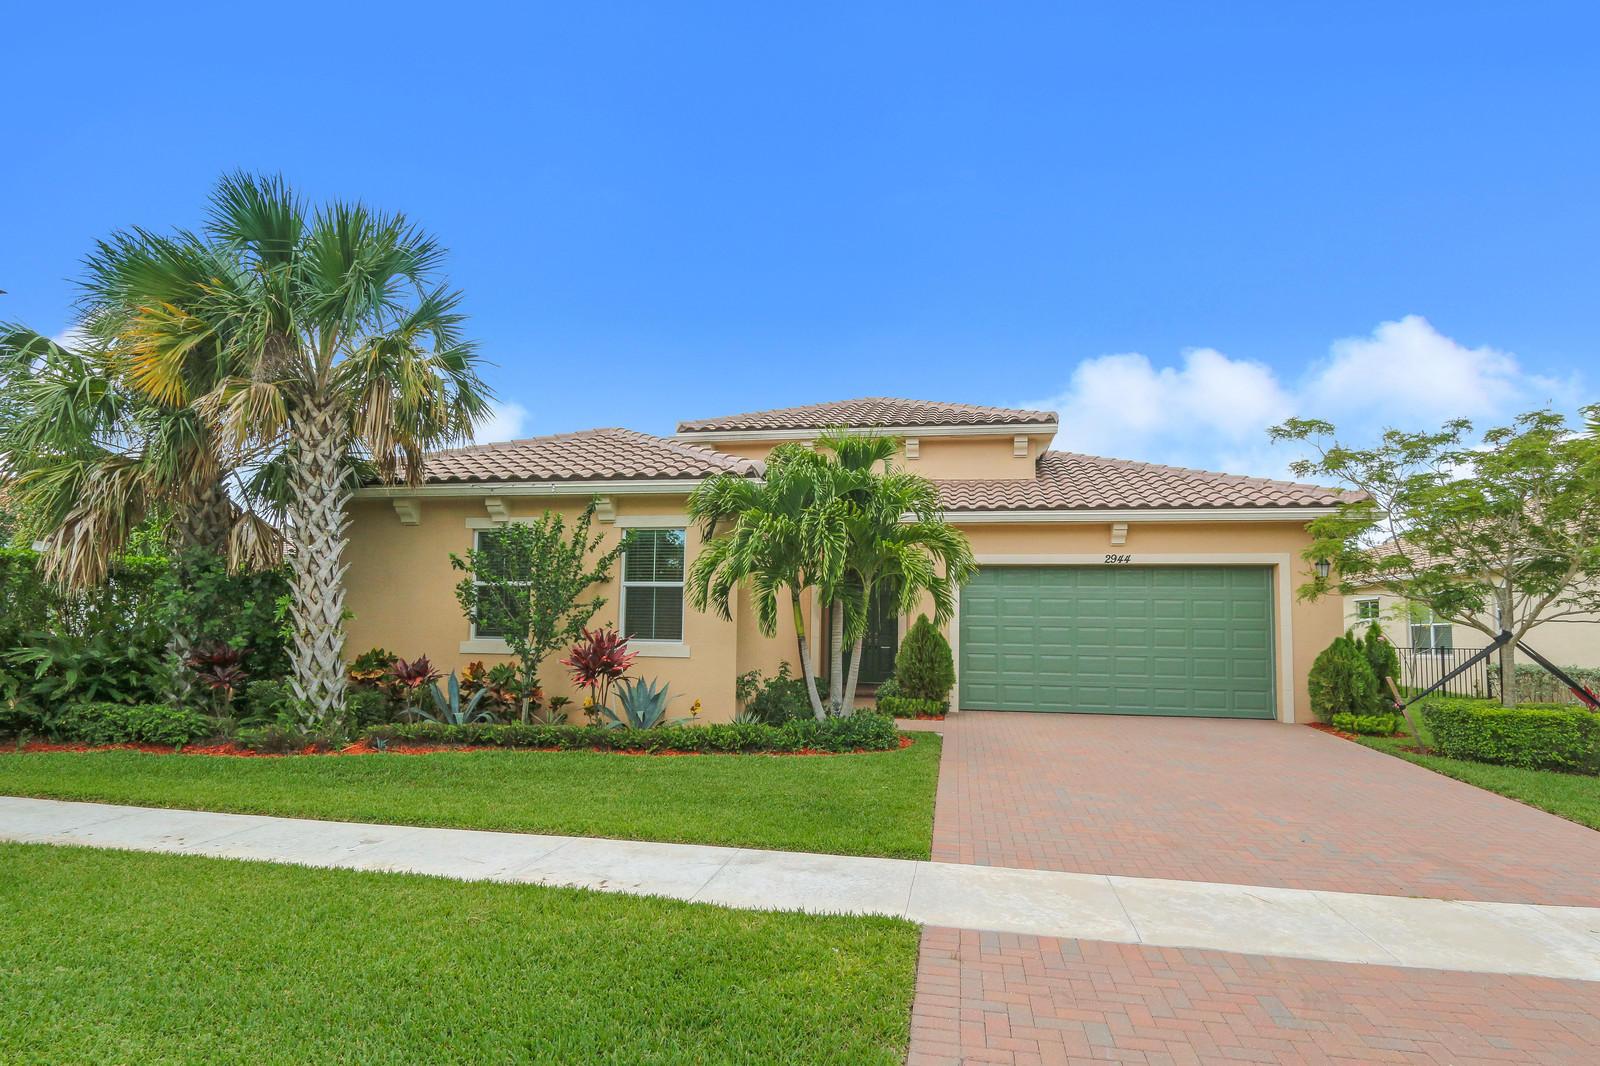 2944 Bellarosa Circle, Royal Palm Beach, FL 33411